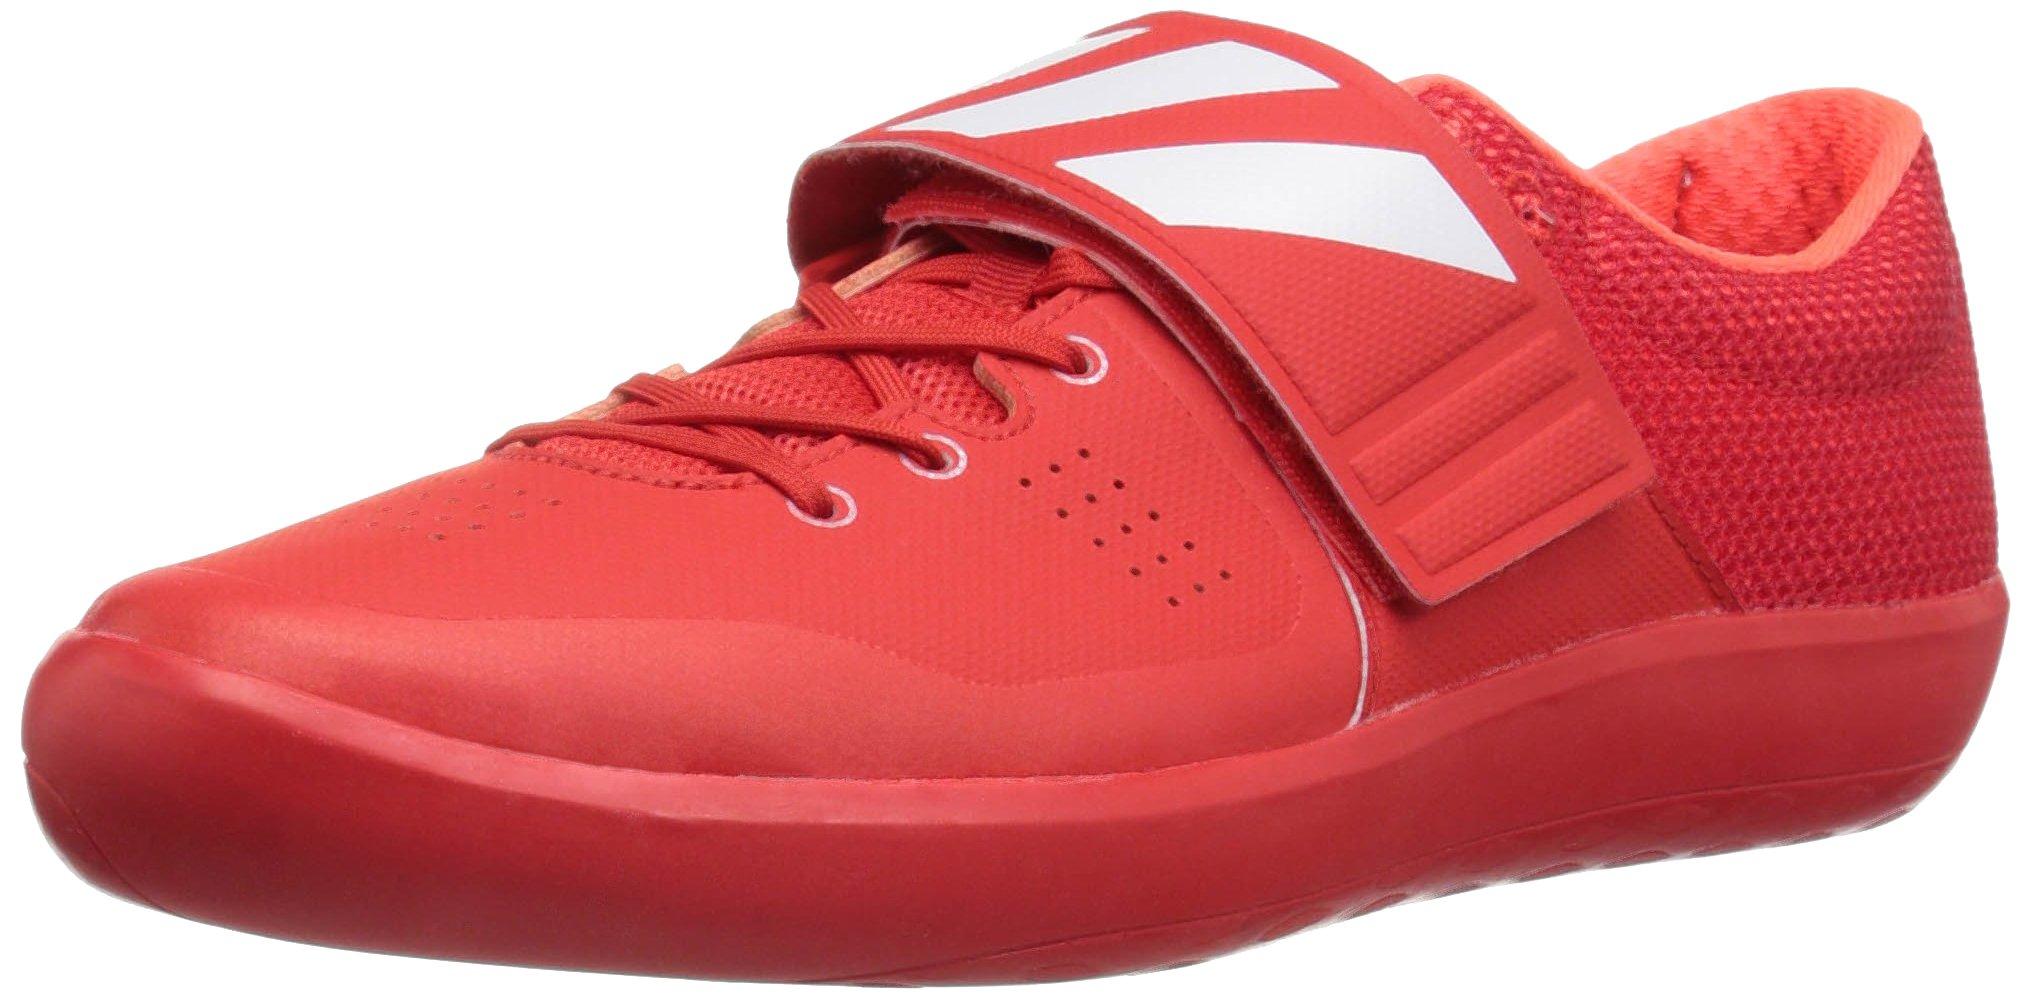 adidas Adizero Shotput Track Shoe, Red/White/Infrared, 6 M US by adidas